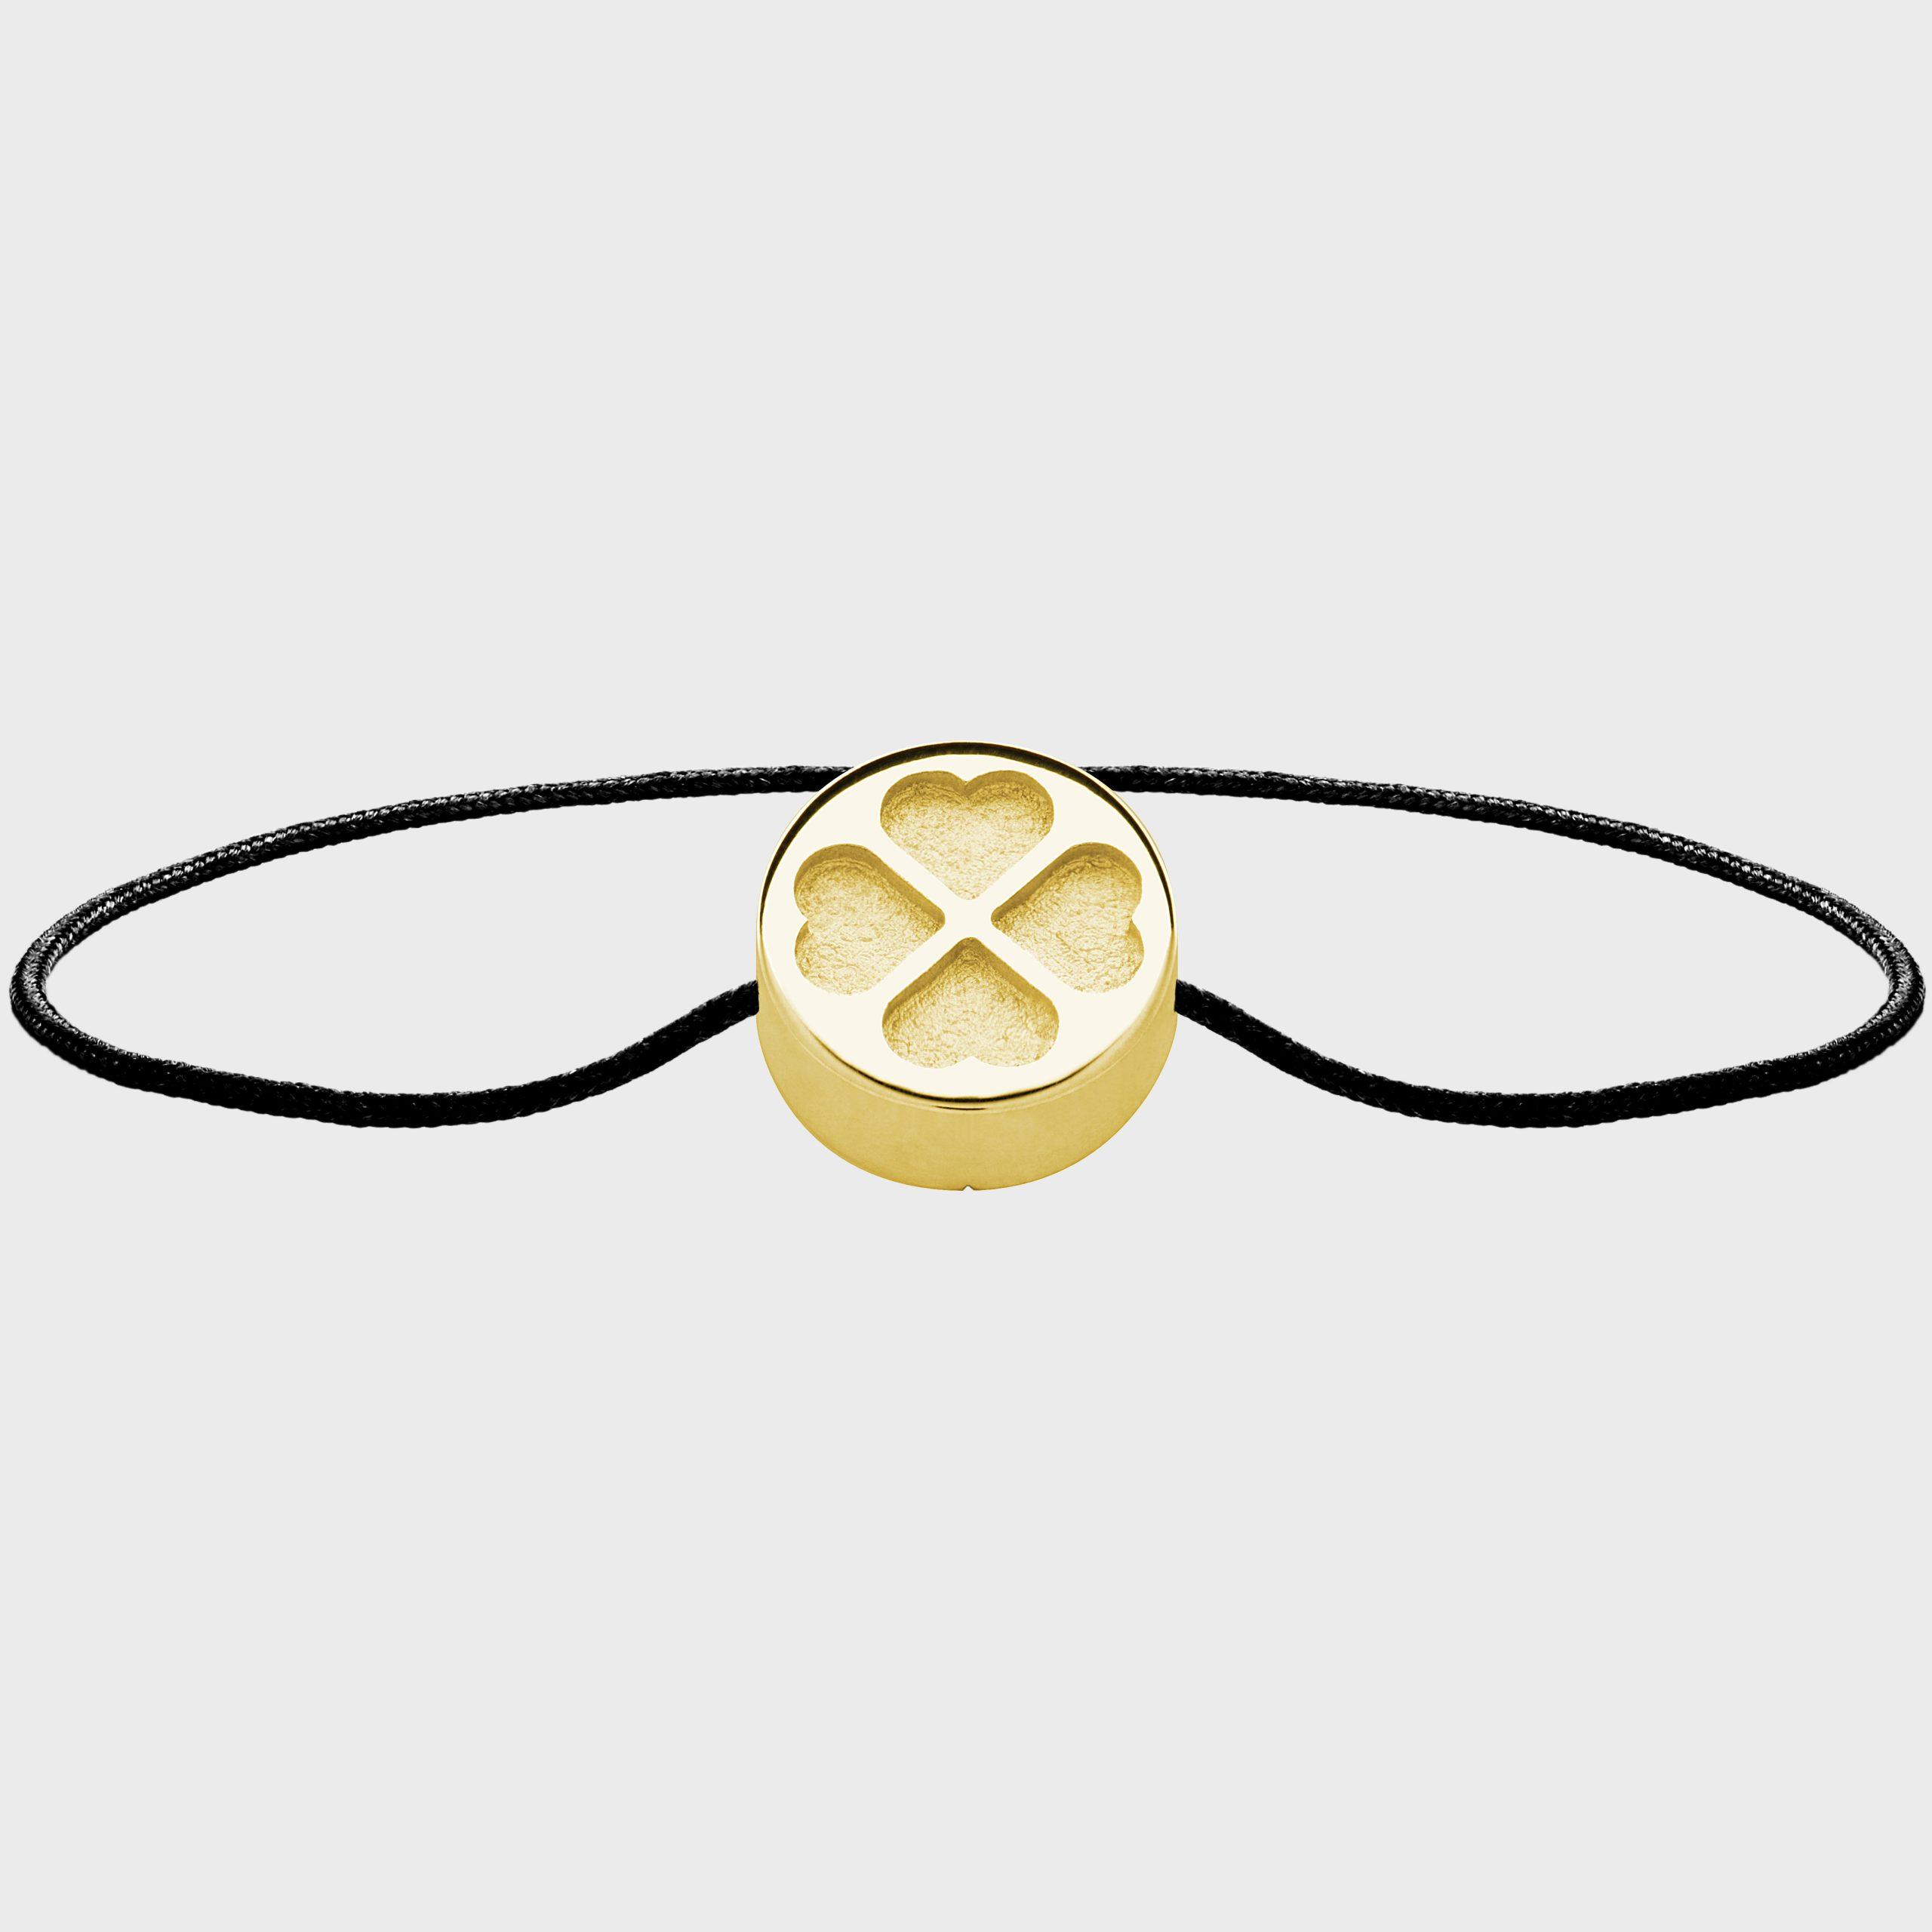 Armband Glücksklee - Max Grün - RINGKING